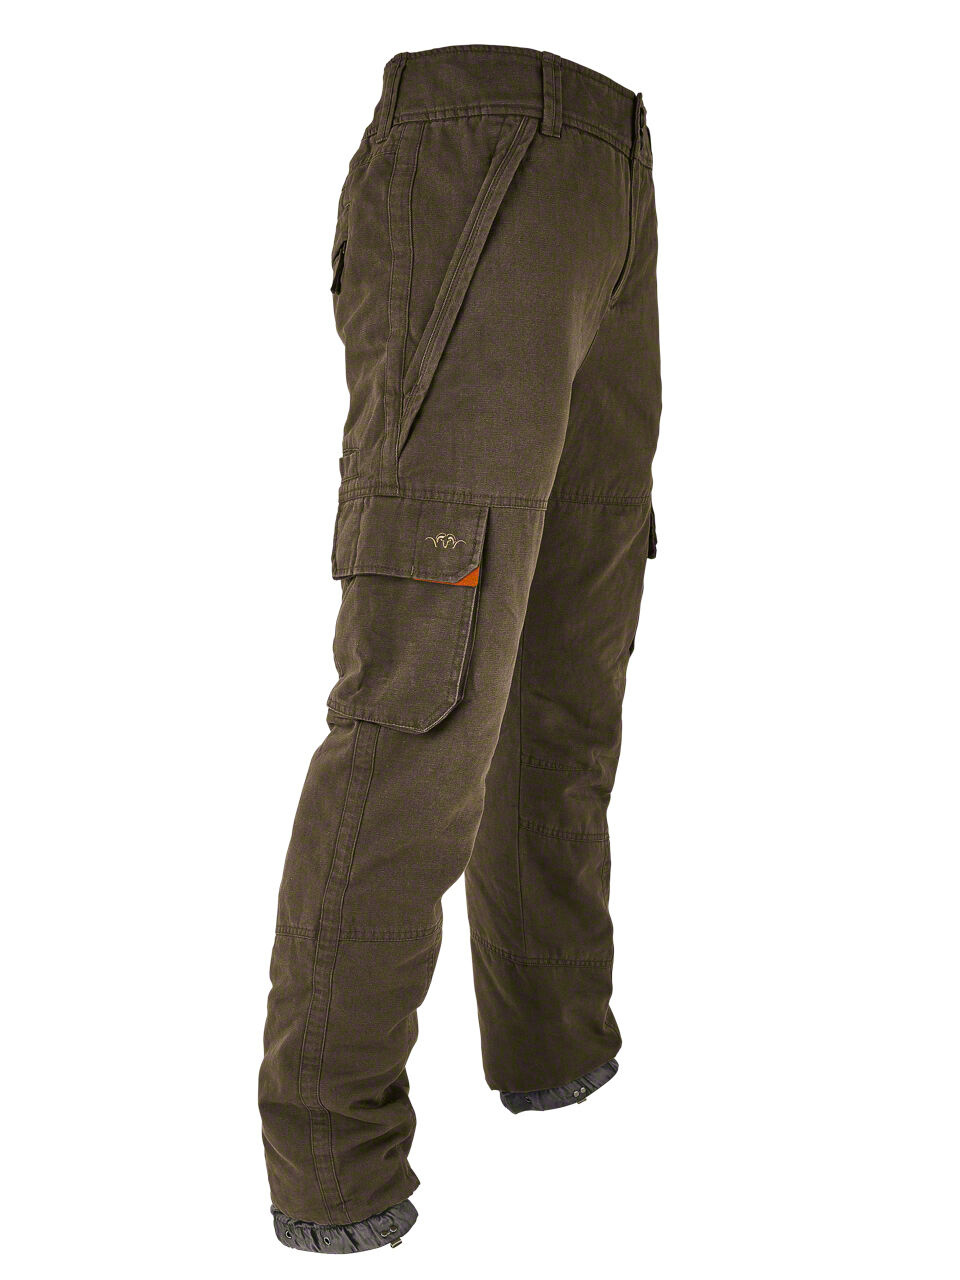 Blaser Winter Trousers Canvas Bernard Padded Thinsulate - Mud - 116069-117